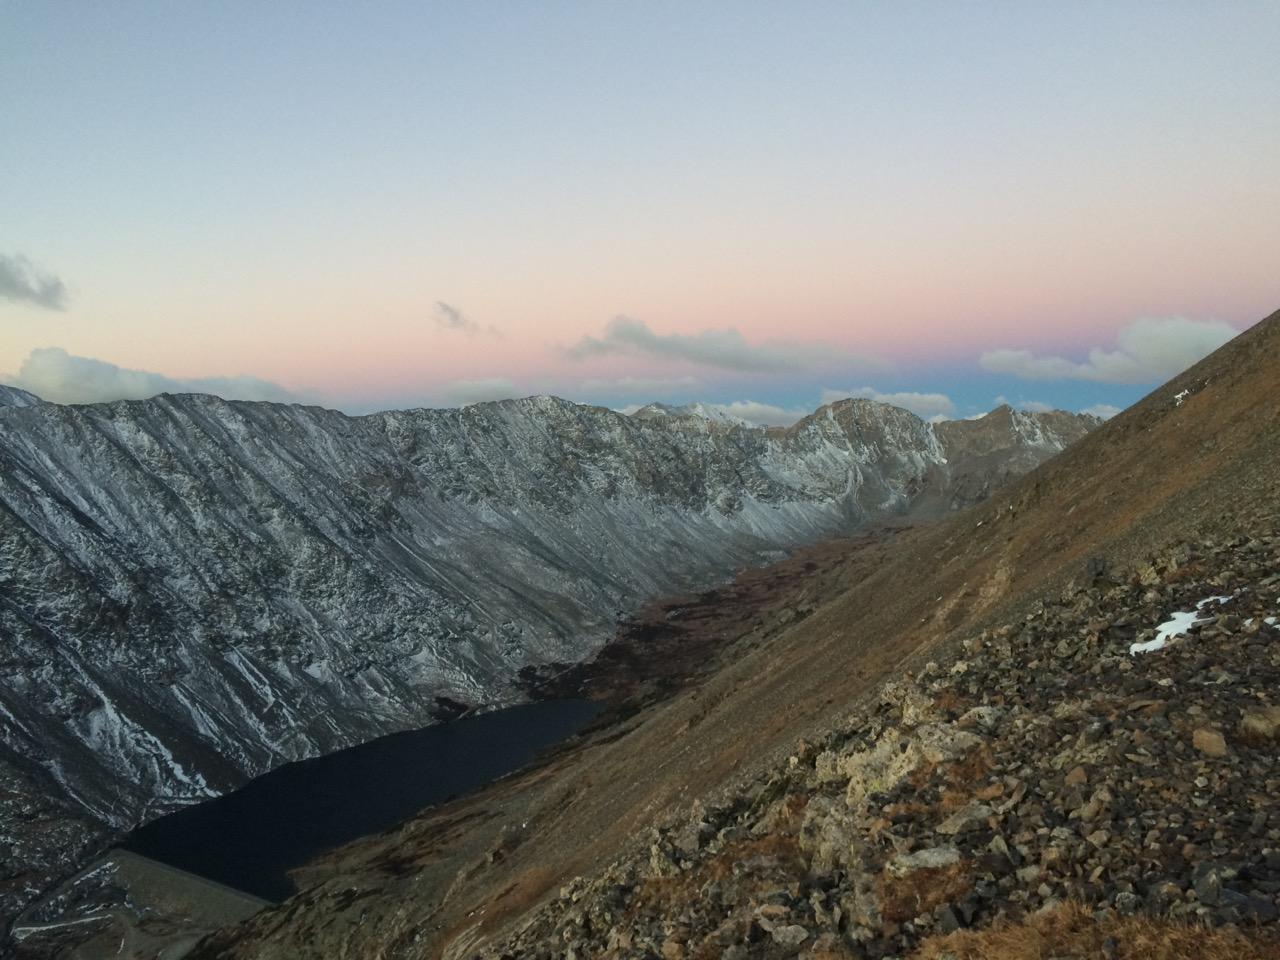 Alpine sunrise on Quandary Peak during Nathalie's field work